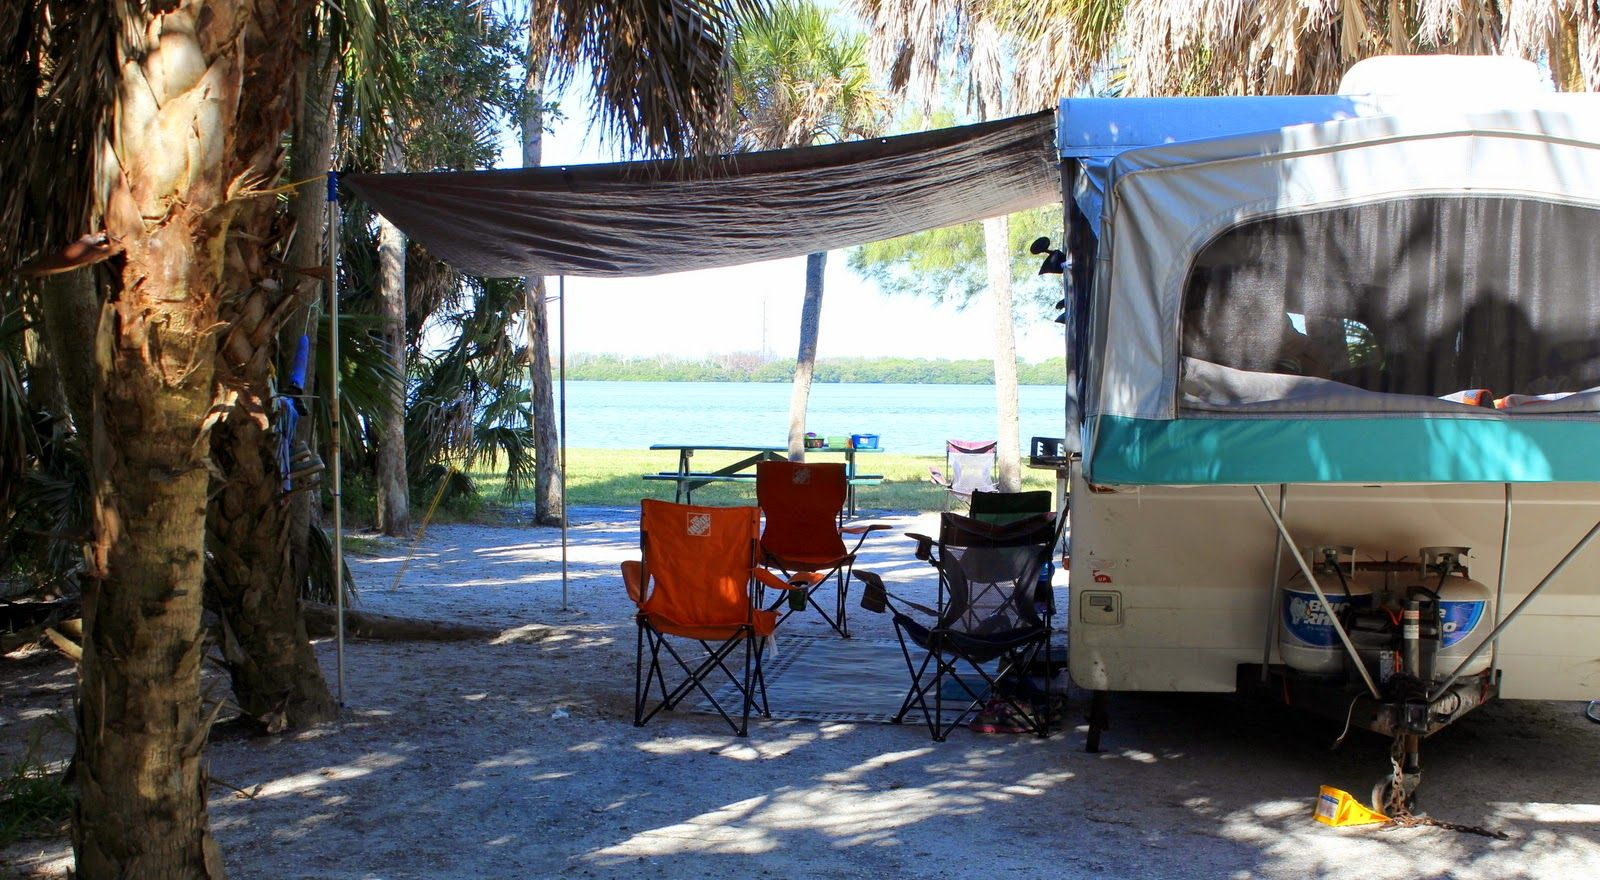 DIY inexpensive Pop Up camper awning | Camping | Pinterest ...